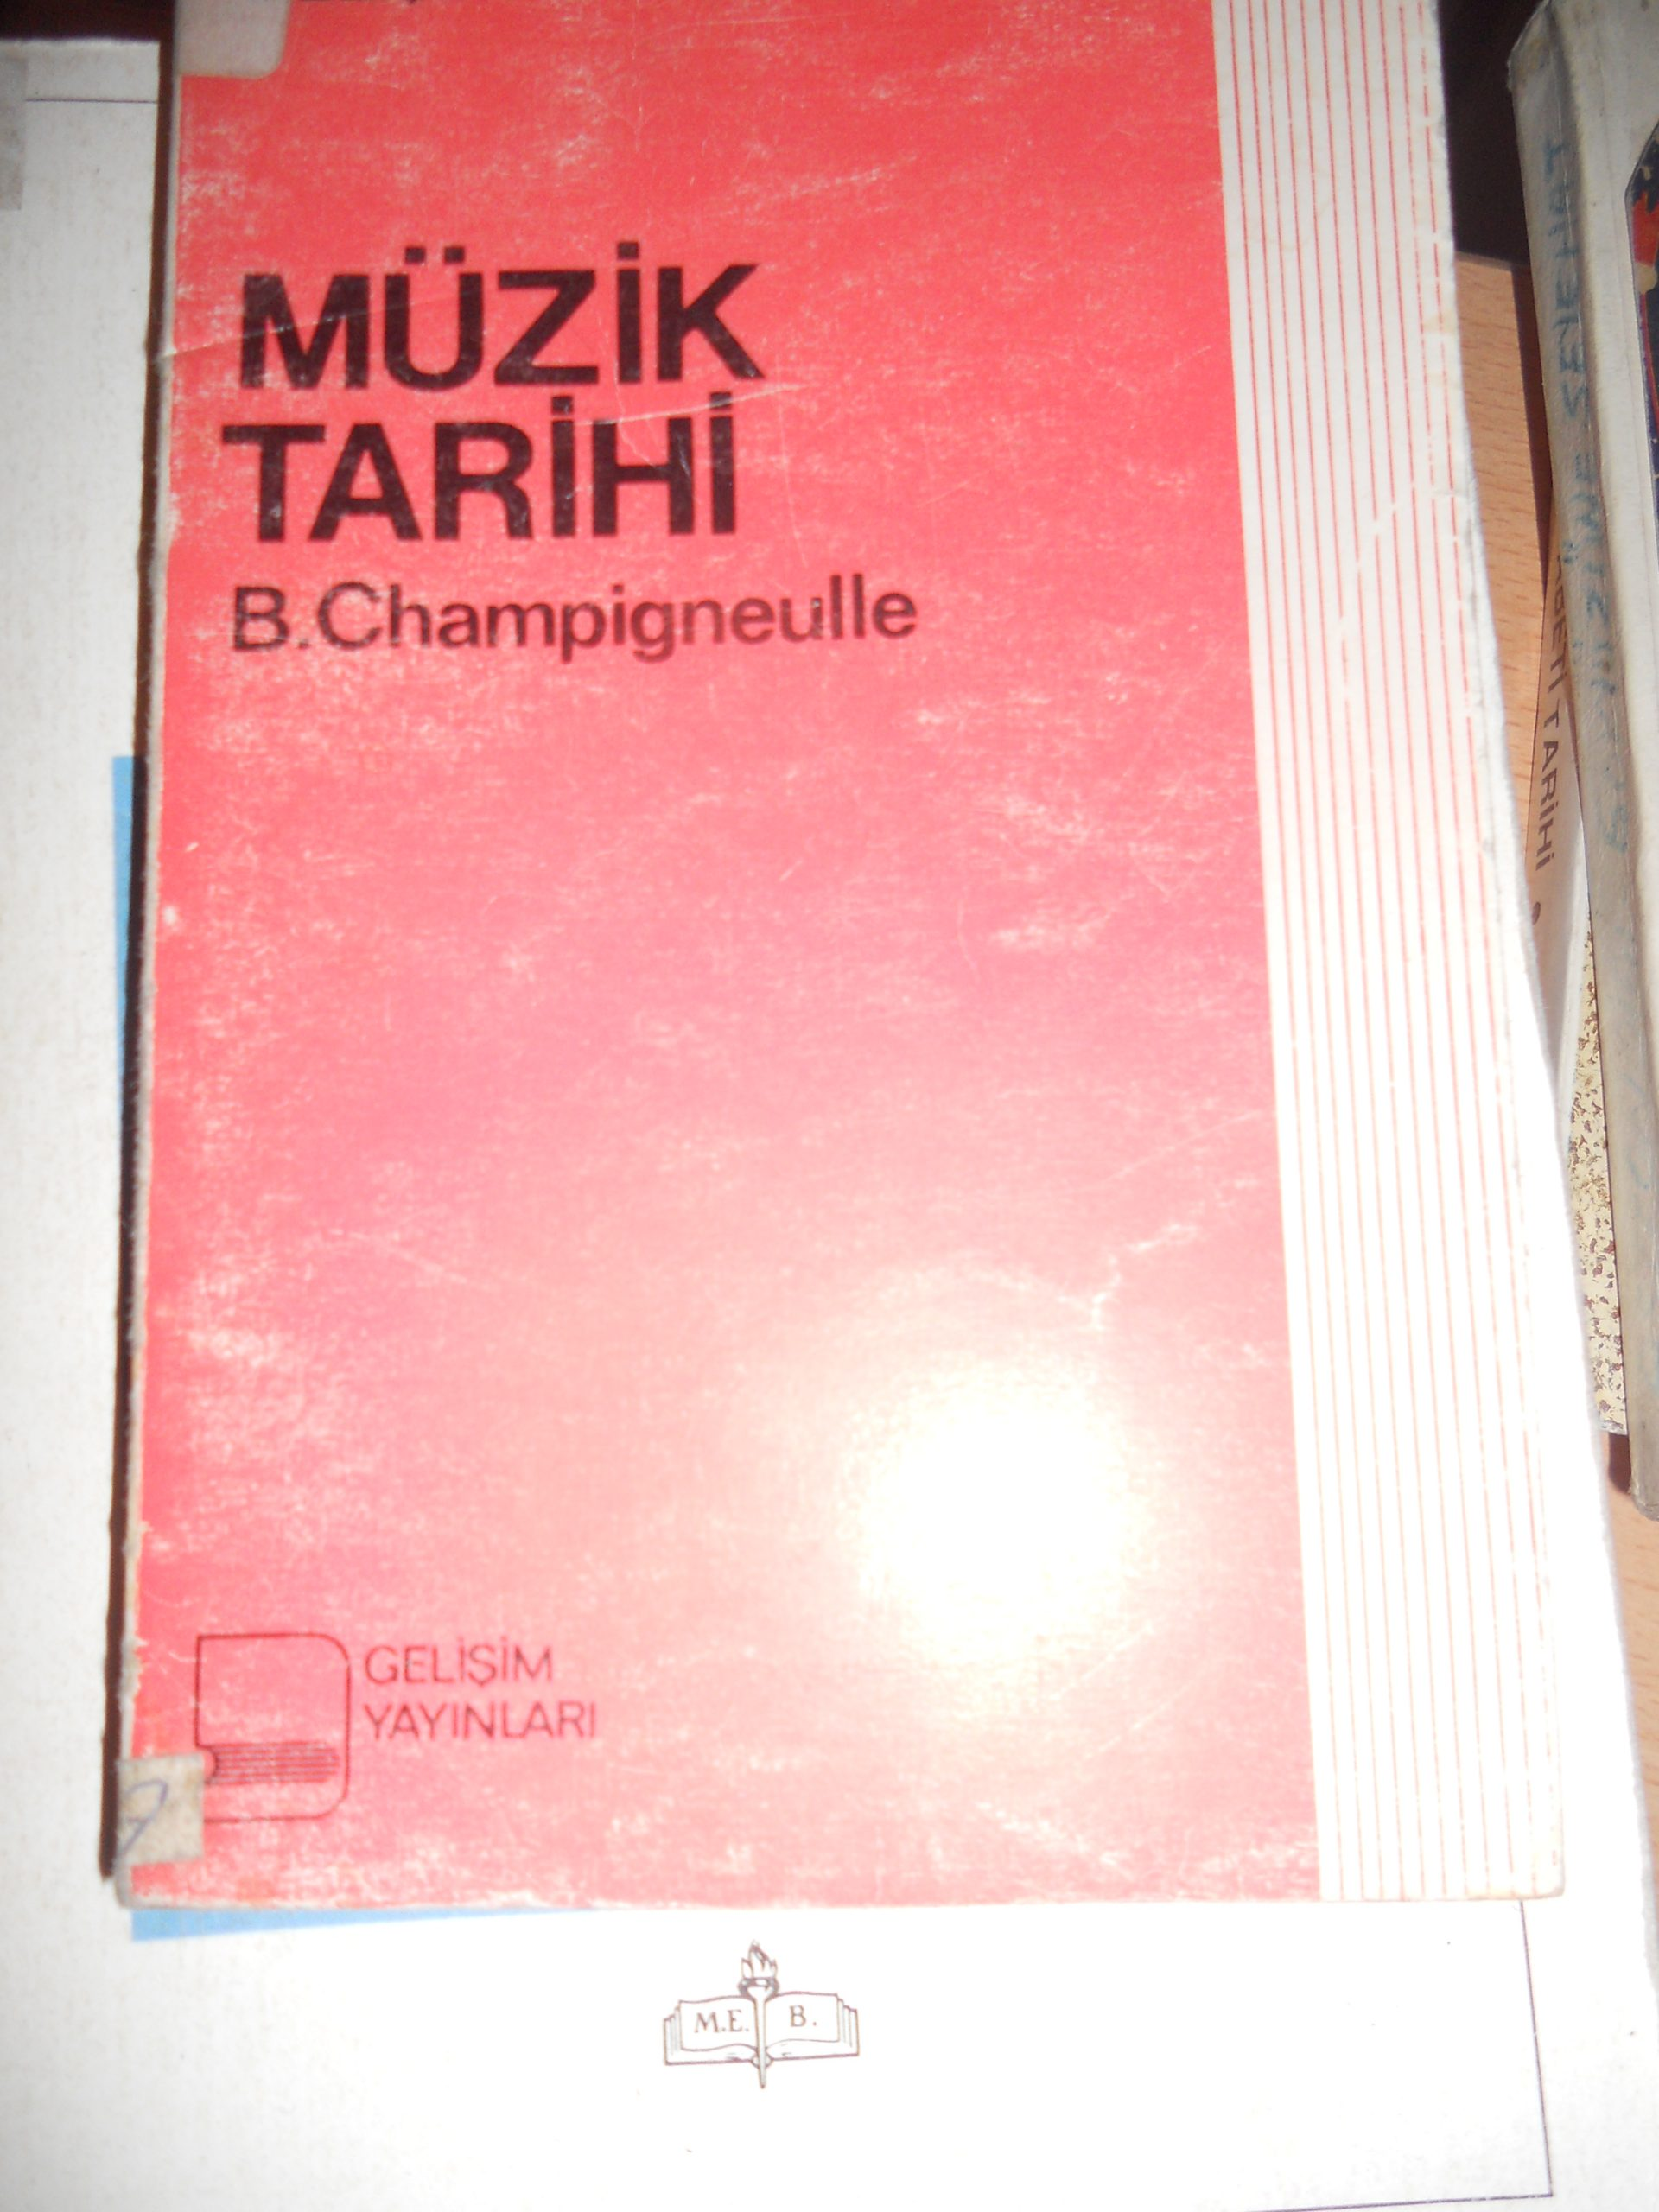 MÜZİK TARİHİ /B.Champigneulle/ 10 tl